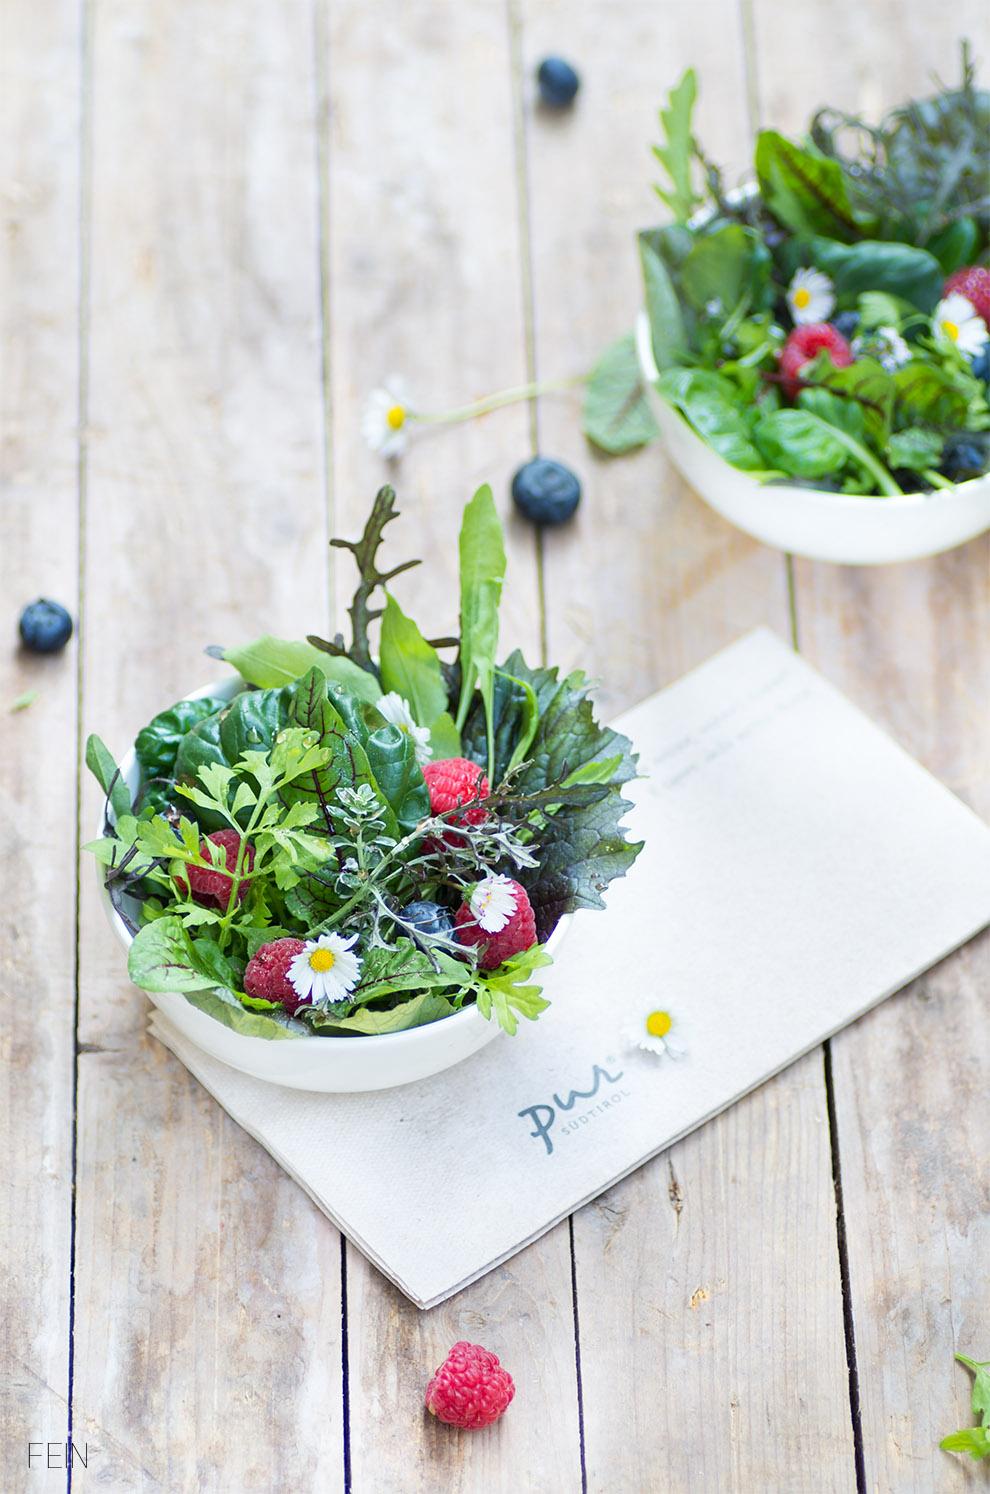 Salat Wildkräuter Pur Schüsselchen